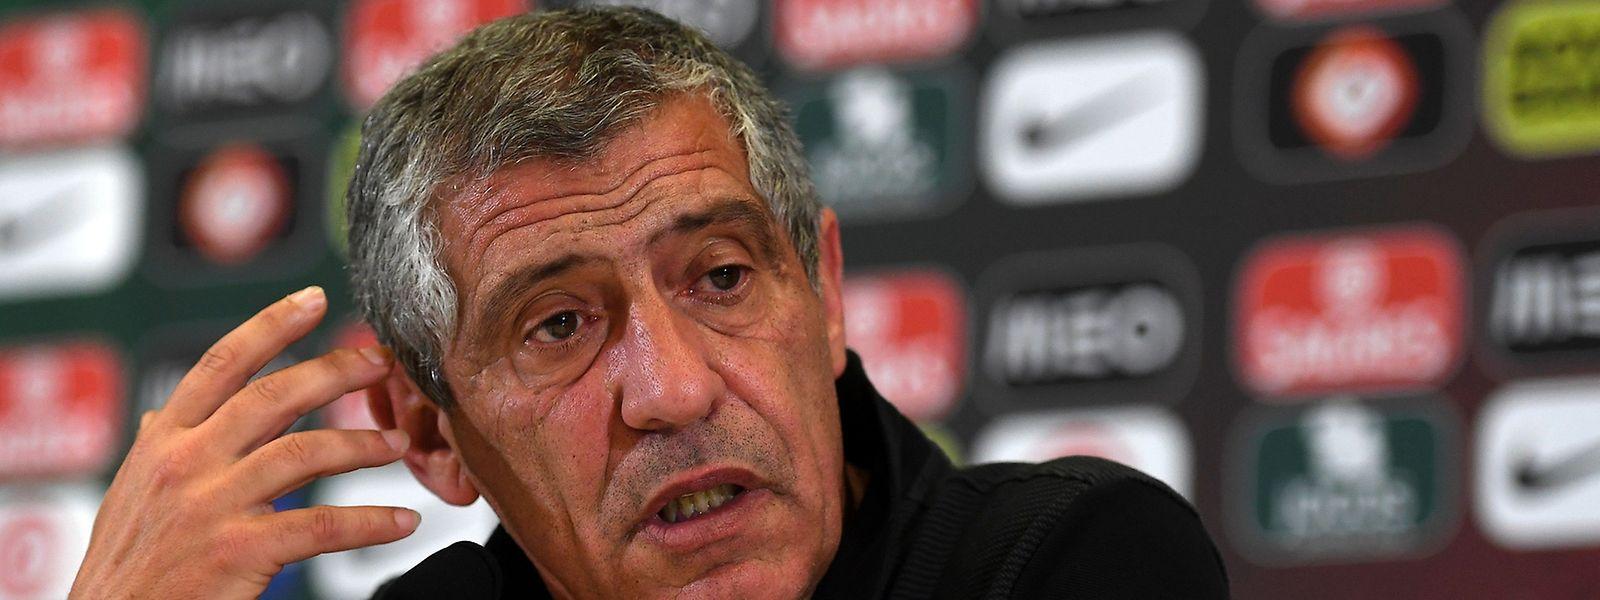 O seleccionador de Portugal, Fernando Santos.